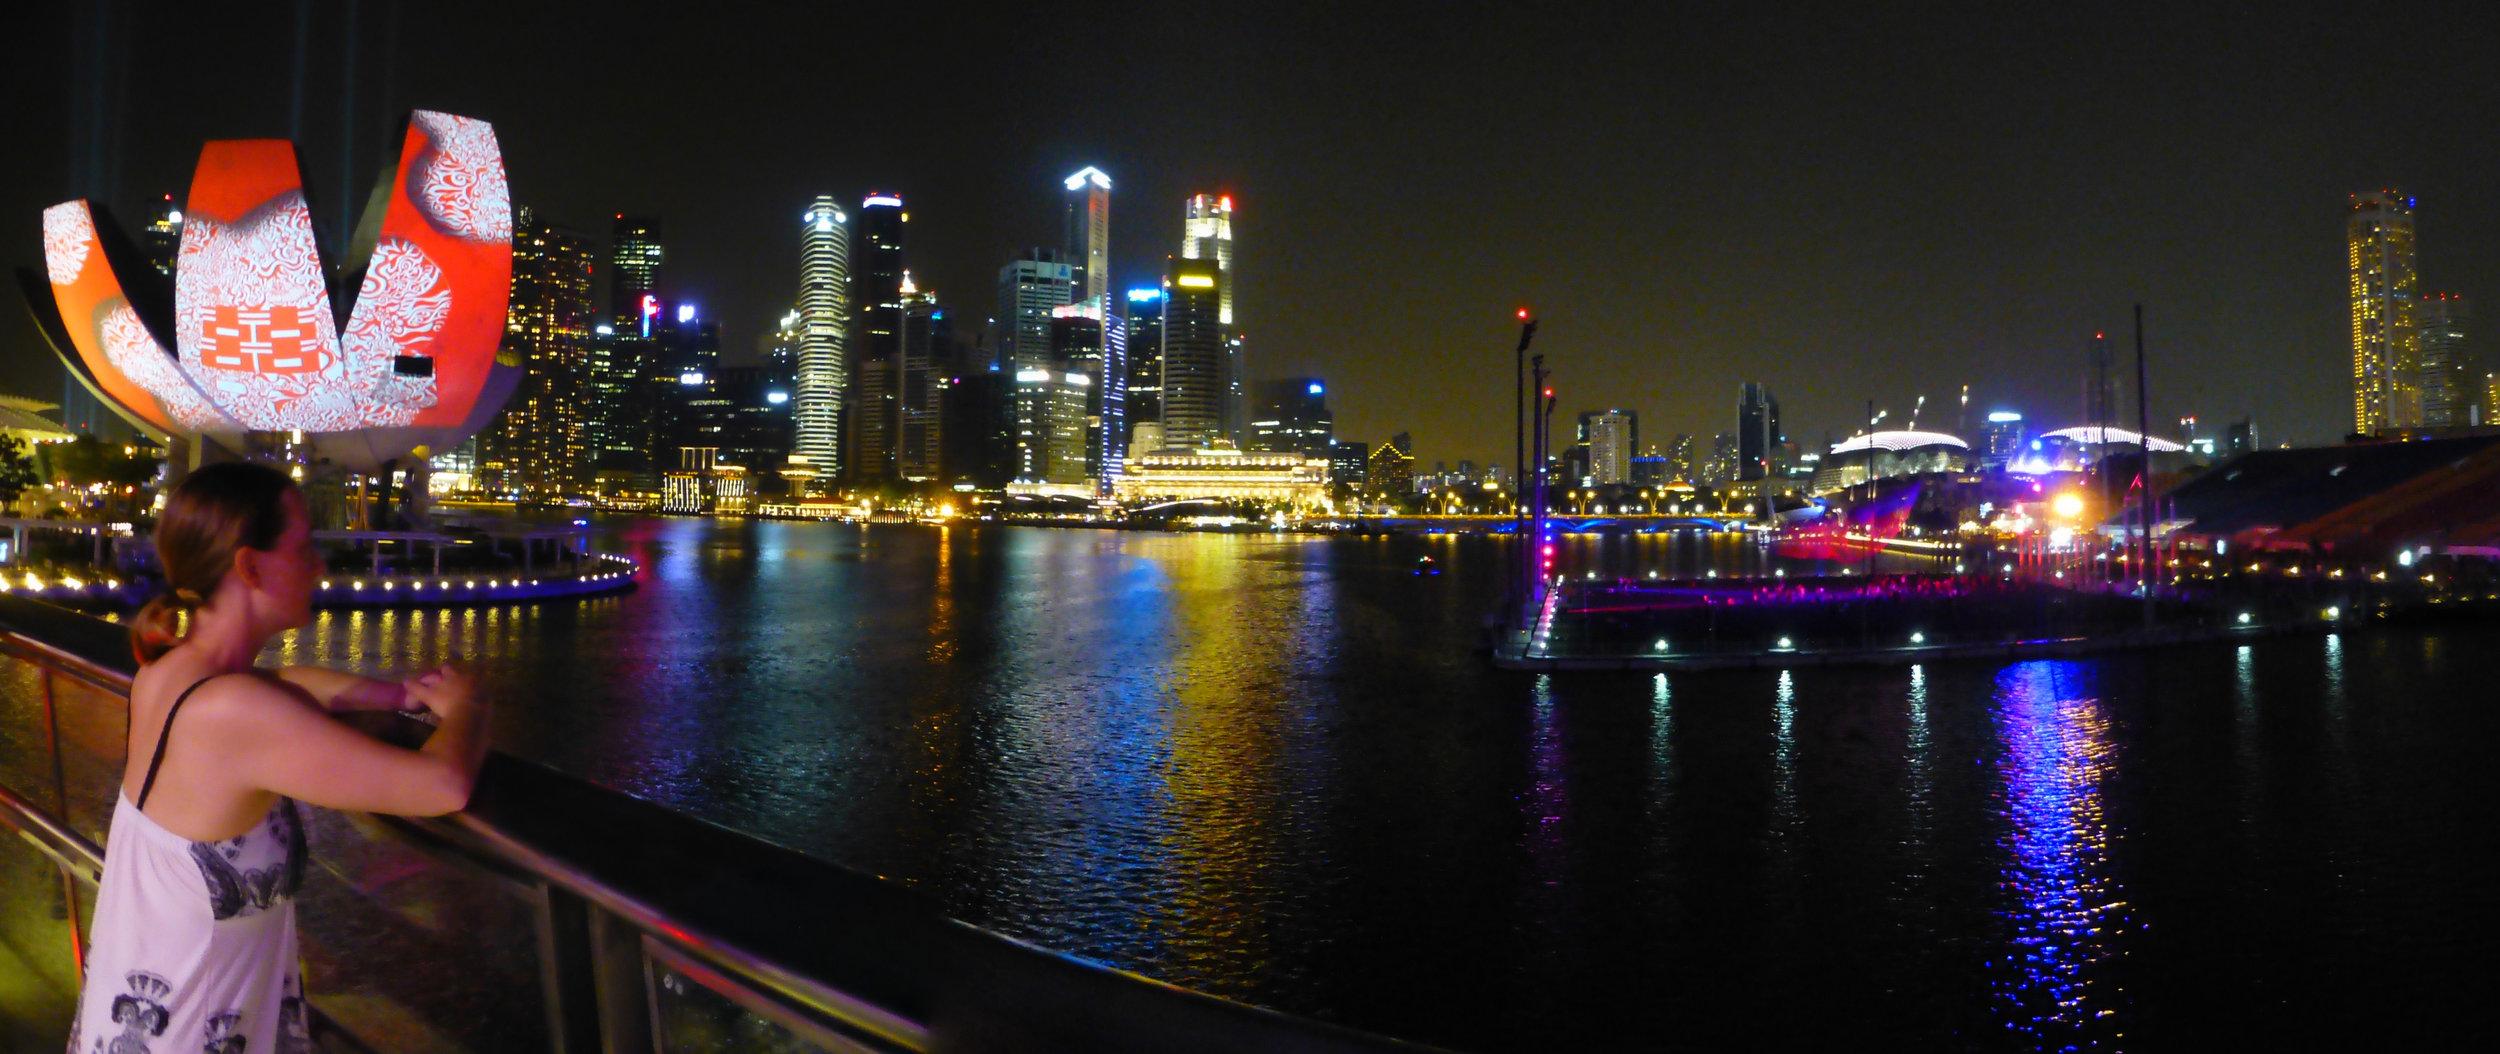 Goodnight Singapore